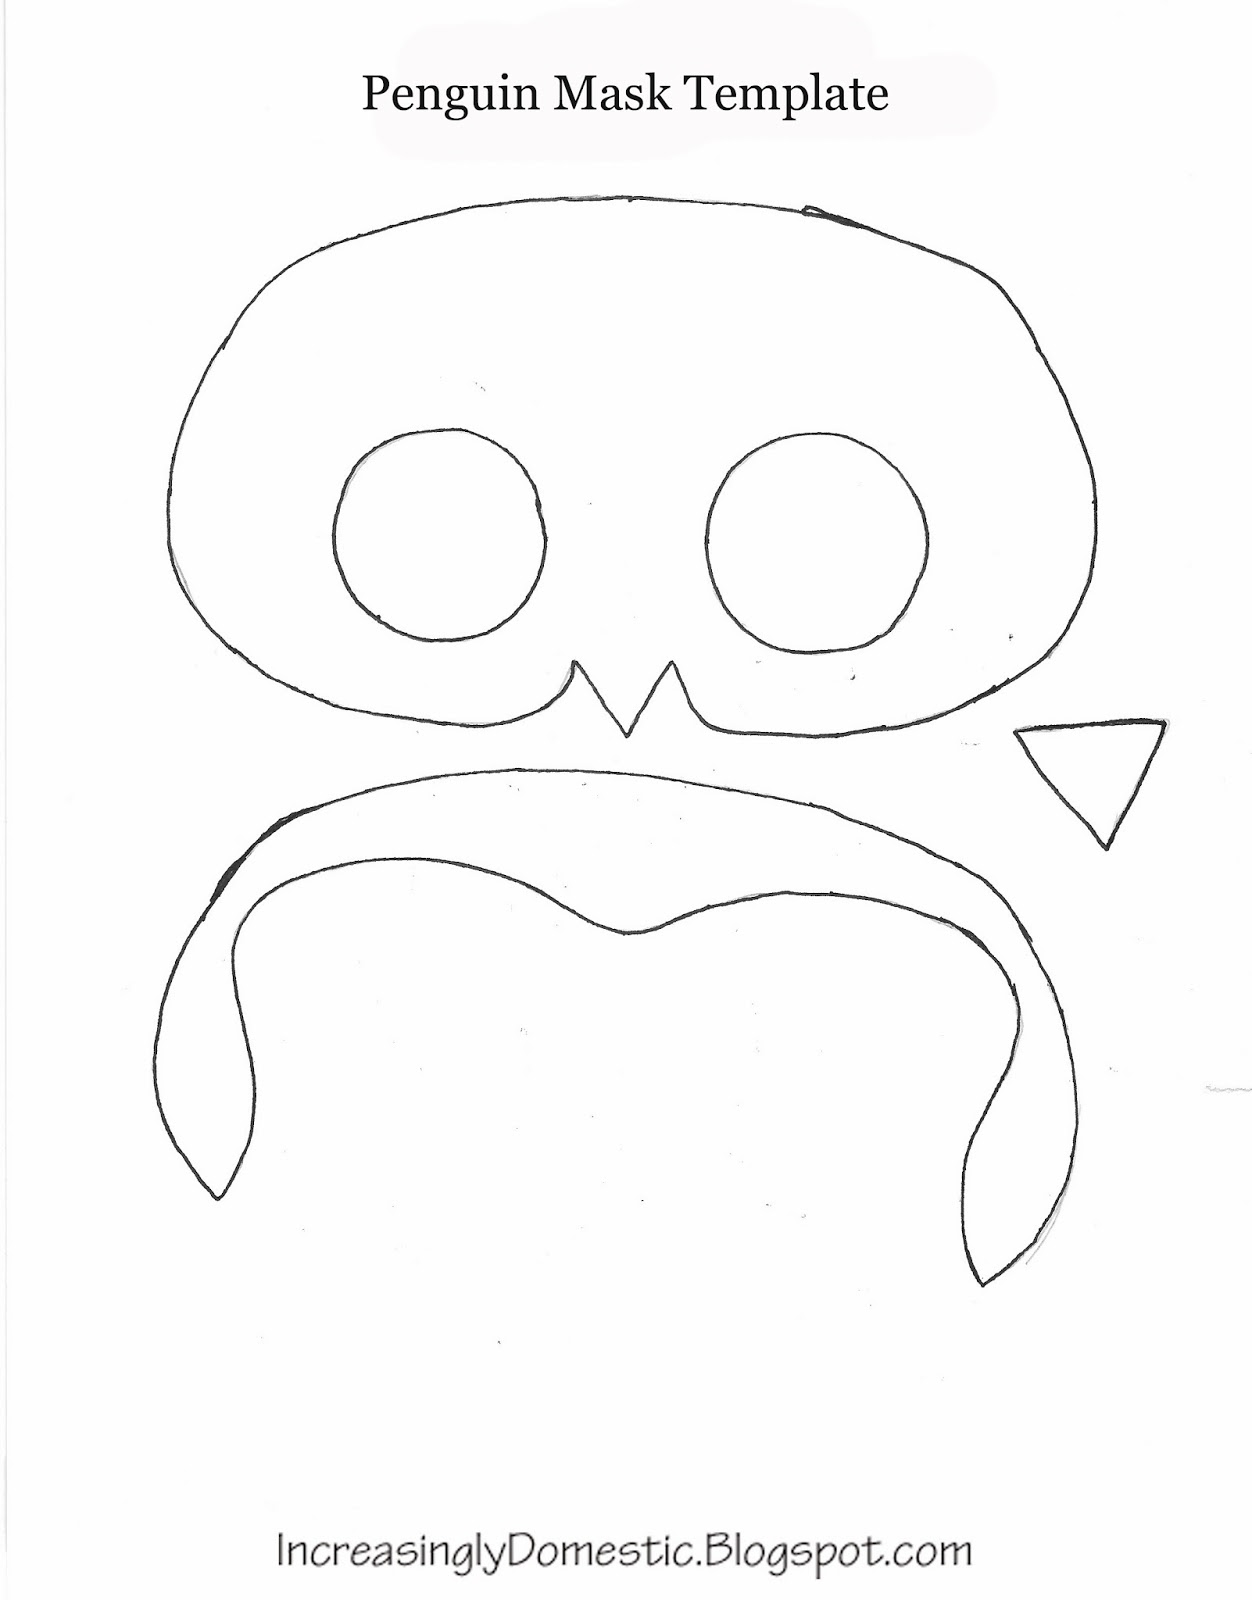 Increasingly Domestic: {Tutorial} Penguin Mask